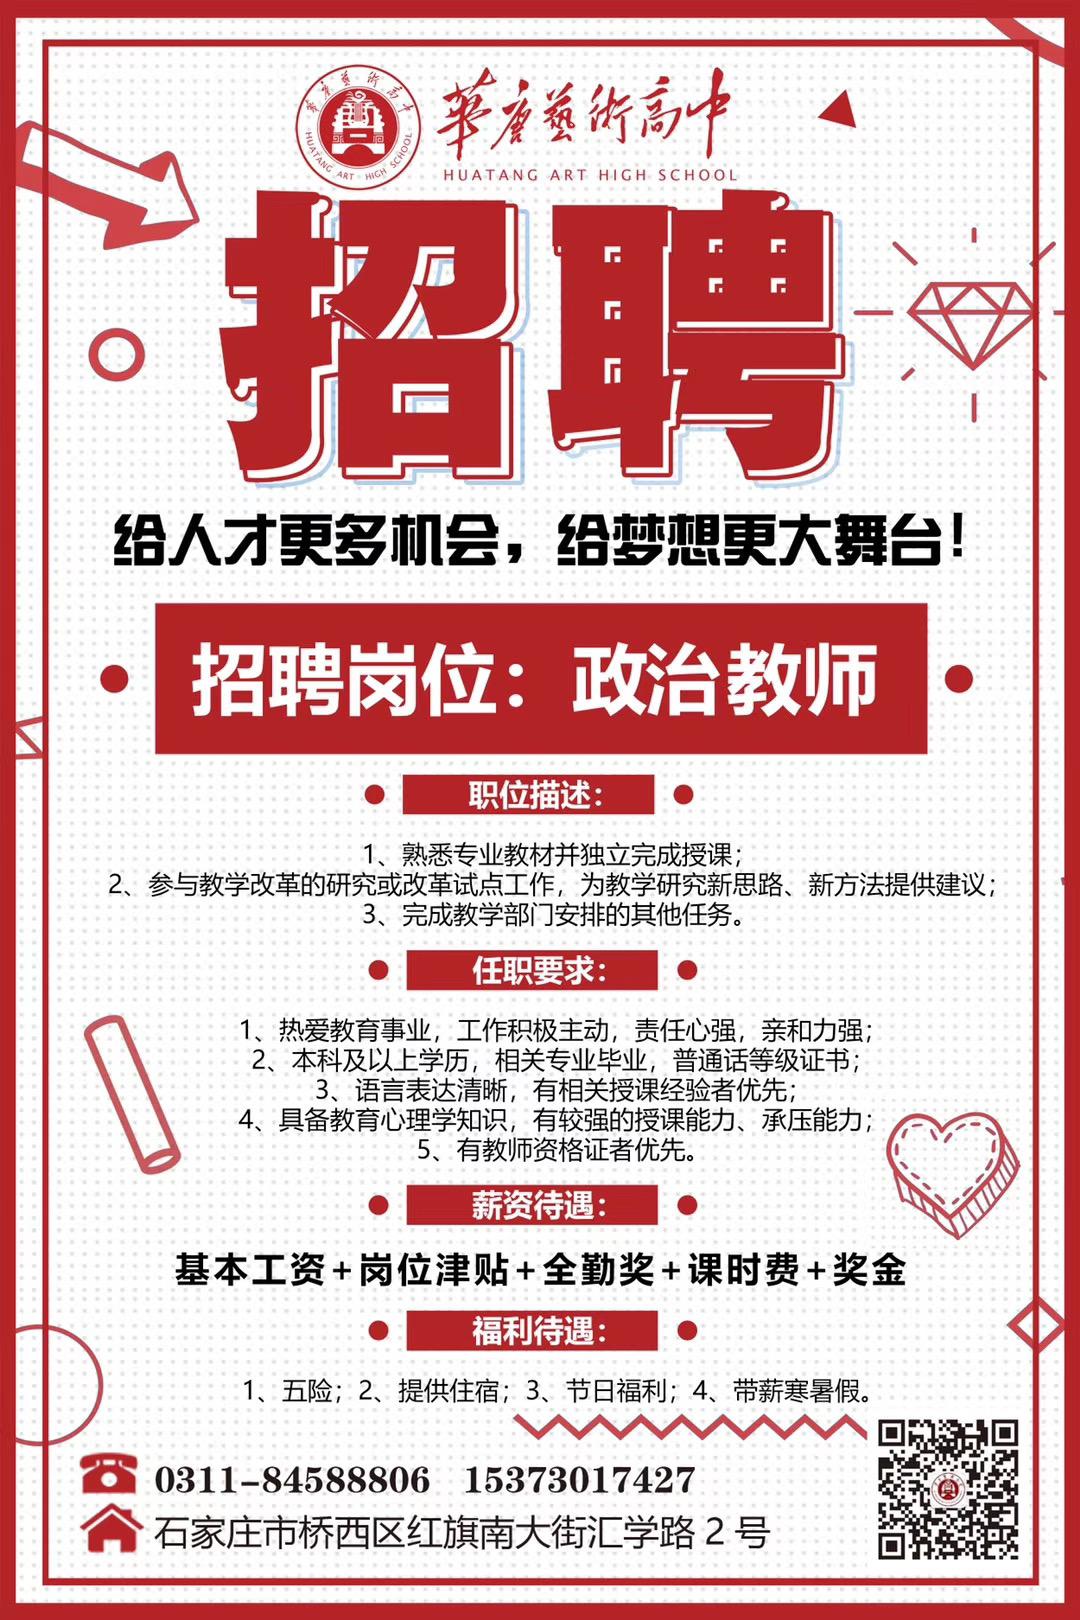 bet36体育在线:華唐藝術高中招聘